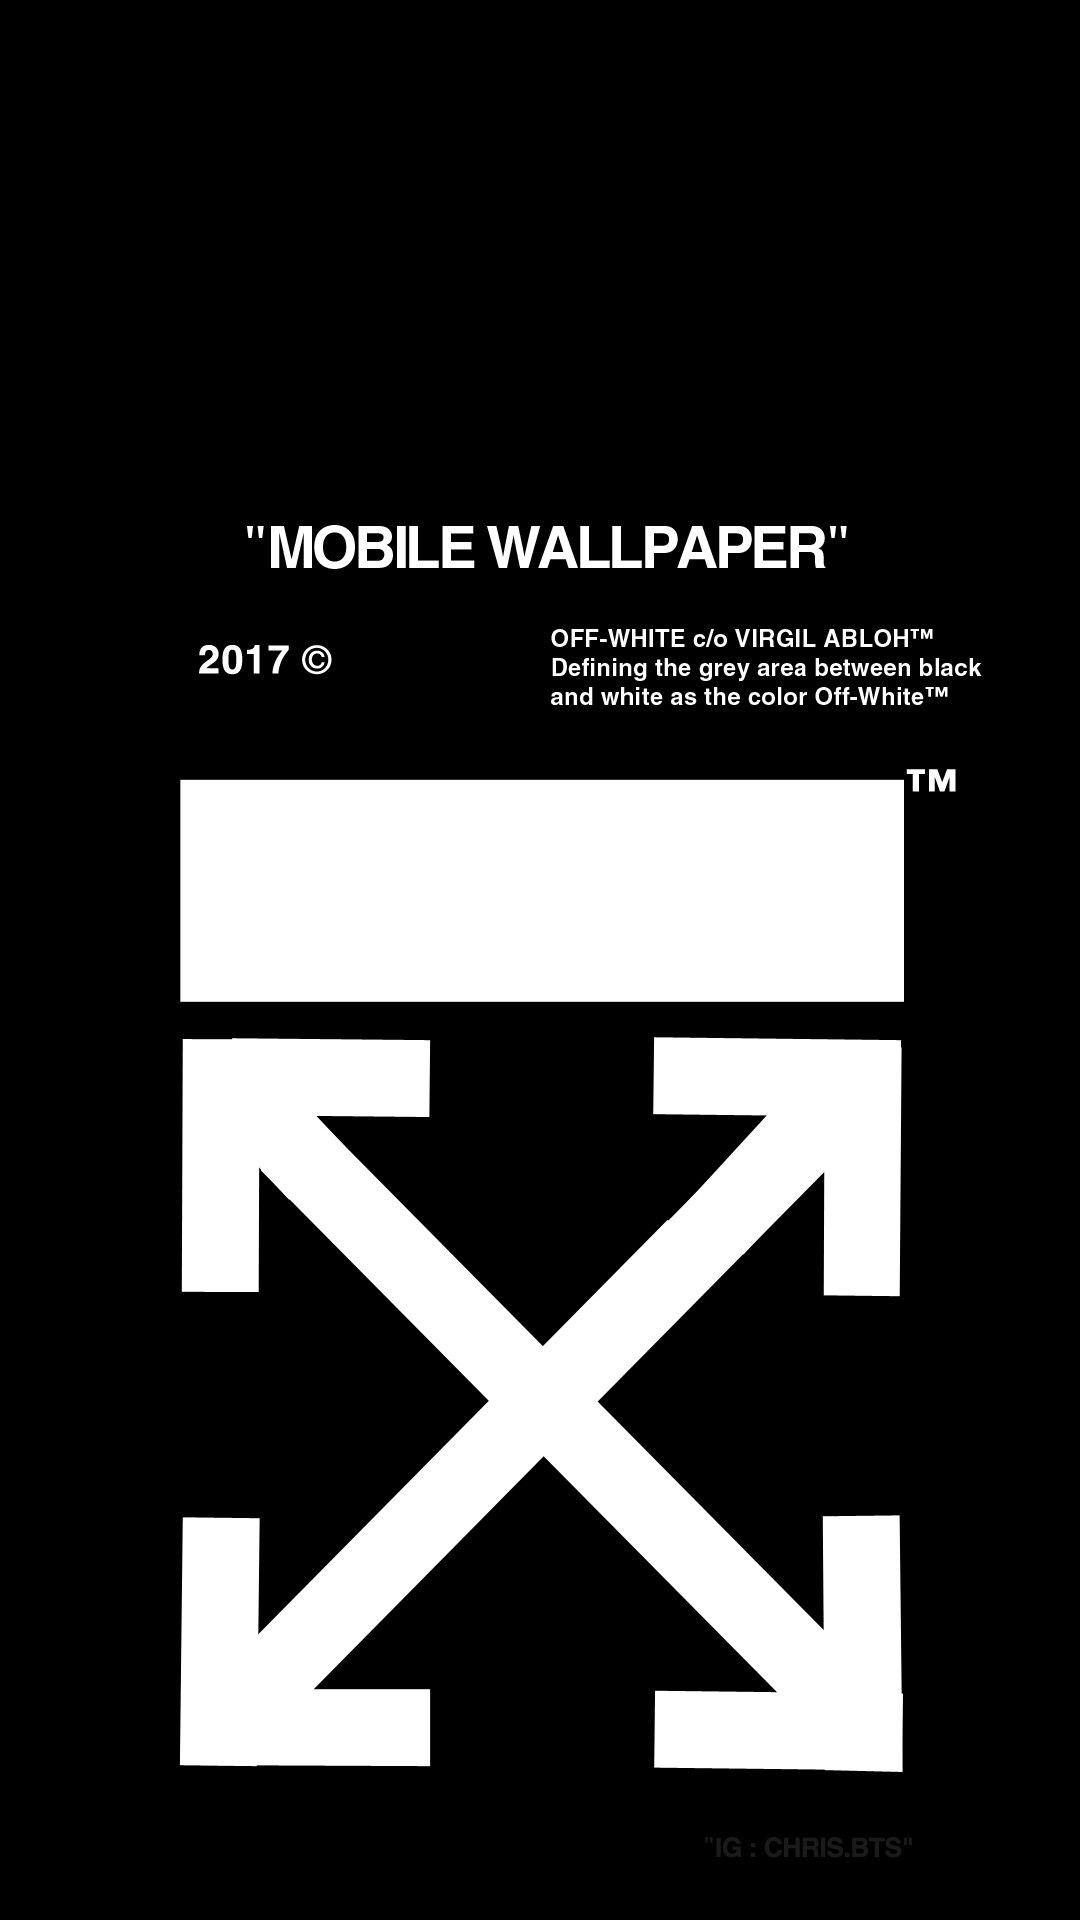 Lovely Gucci Mane Wallpaper Kertas Dinding Latar Belakang Fotografi Abstrak